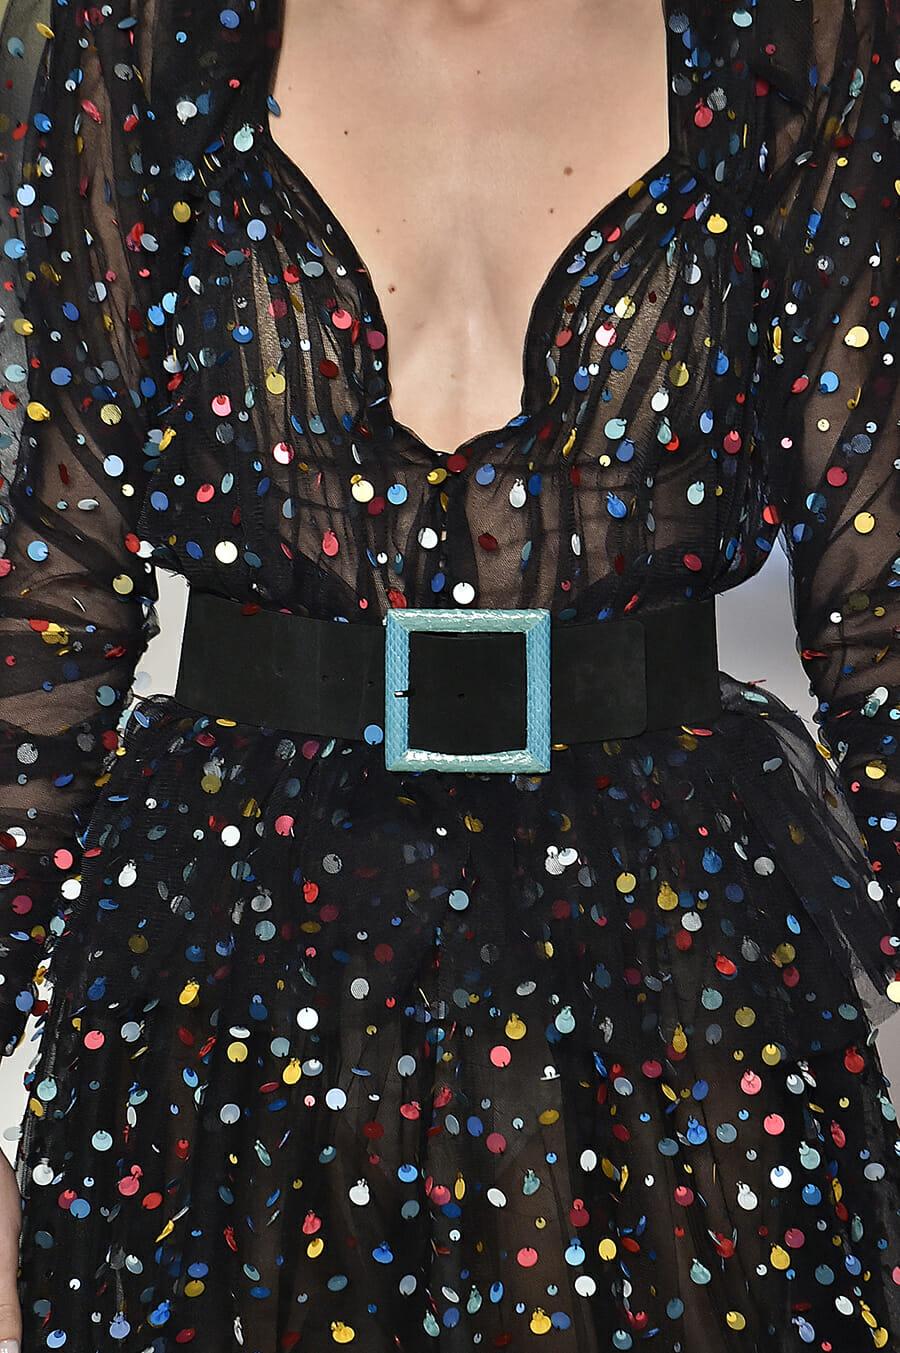 Carolina-Herrera-New-York-Fashion-Week-Spring-Summer-2018-NY-September-2017-look37-detail2